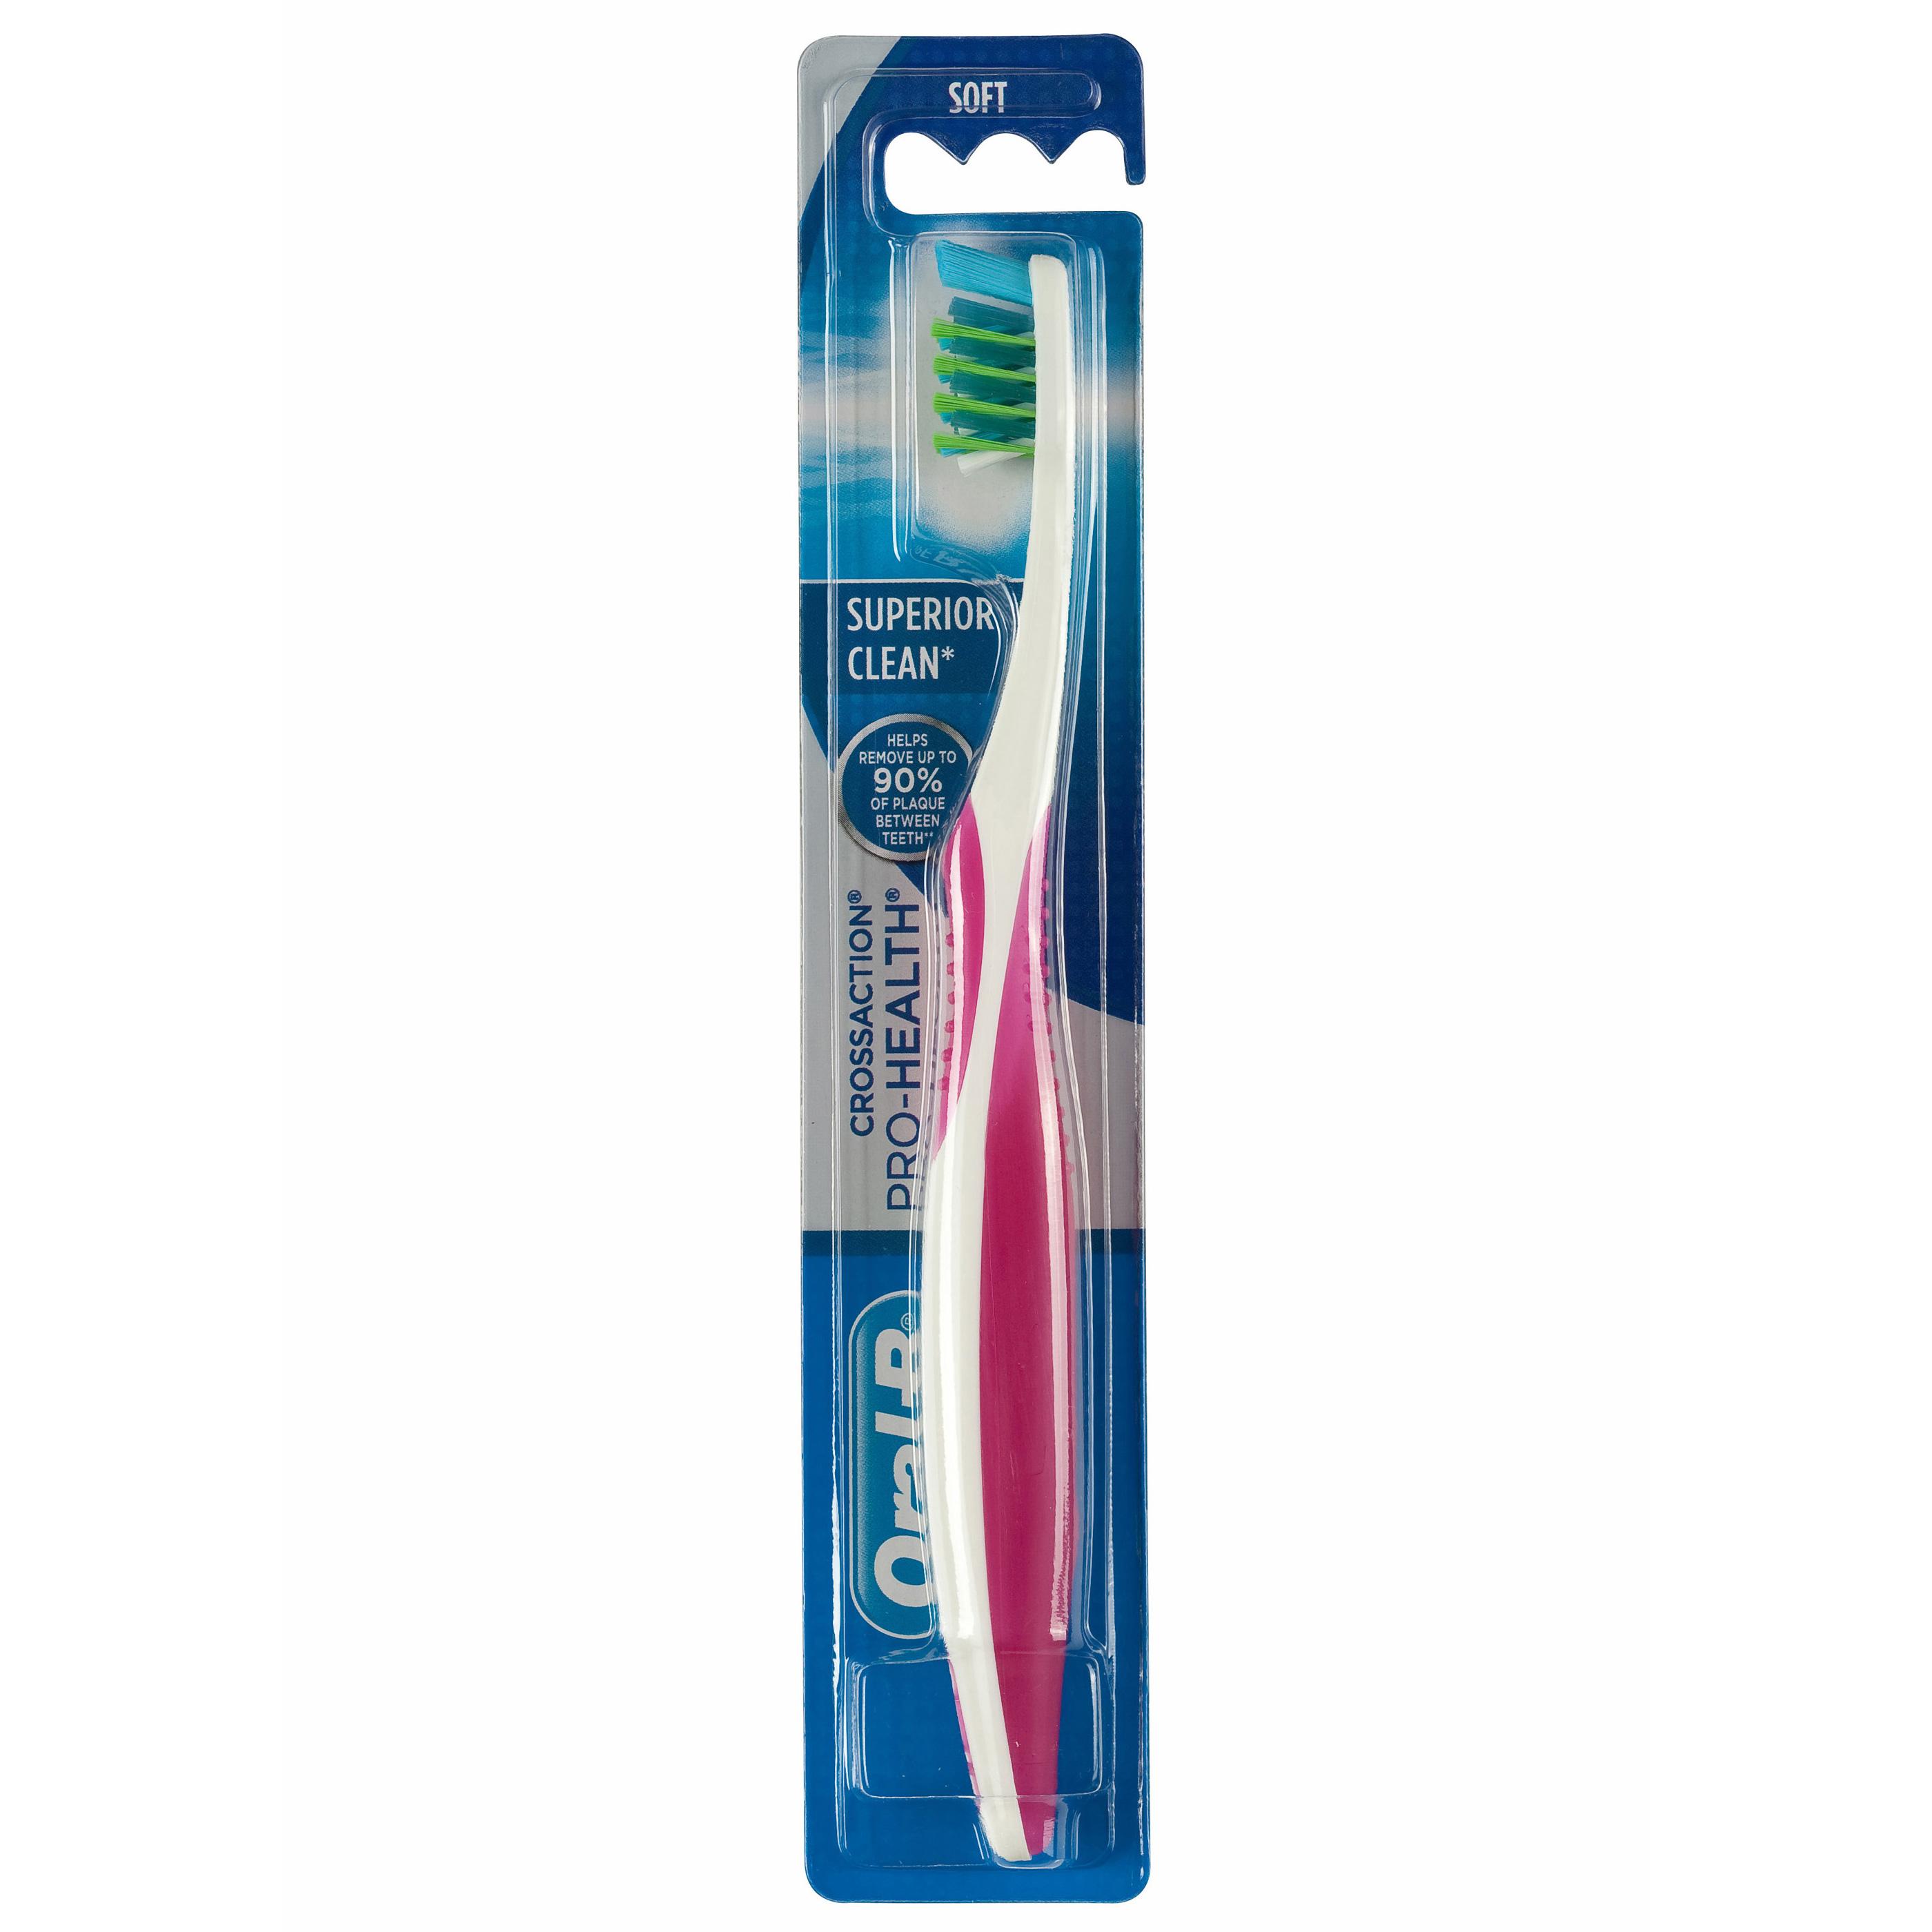 Oral-b tandenborstel pro-expert junior 8+ soft